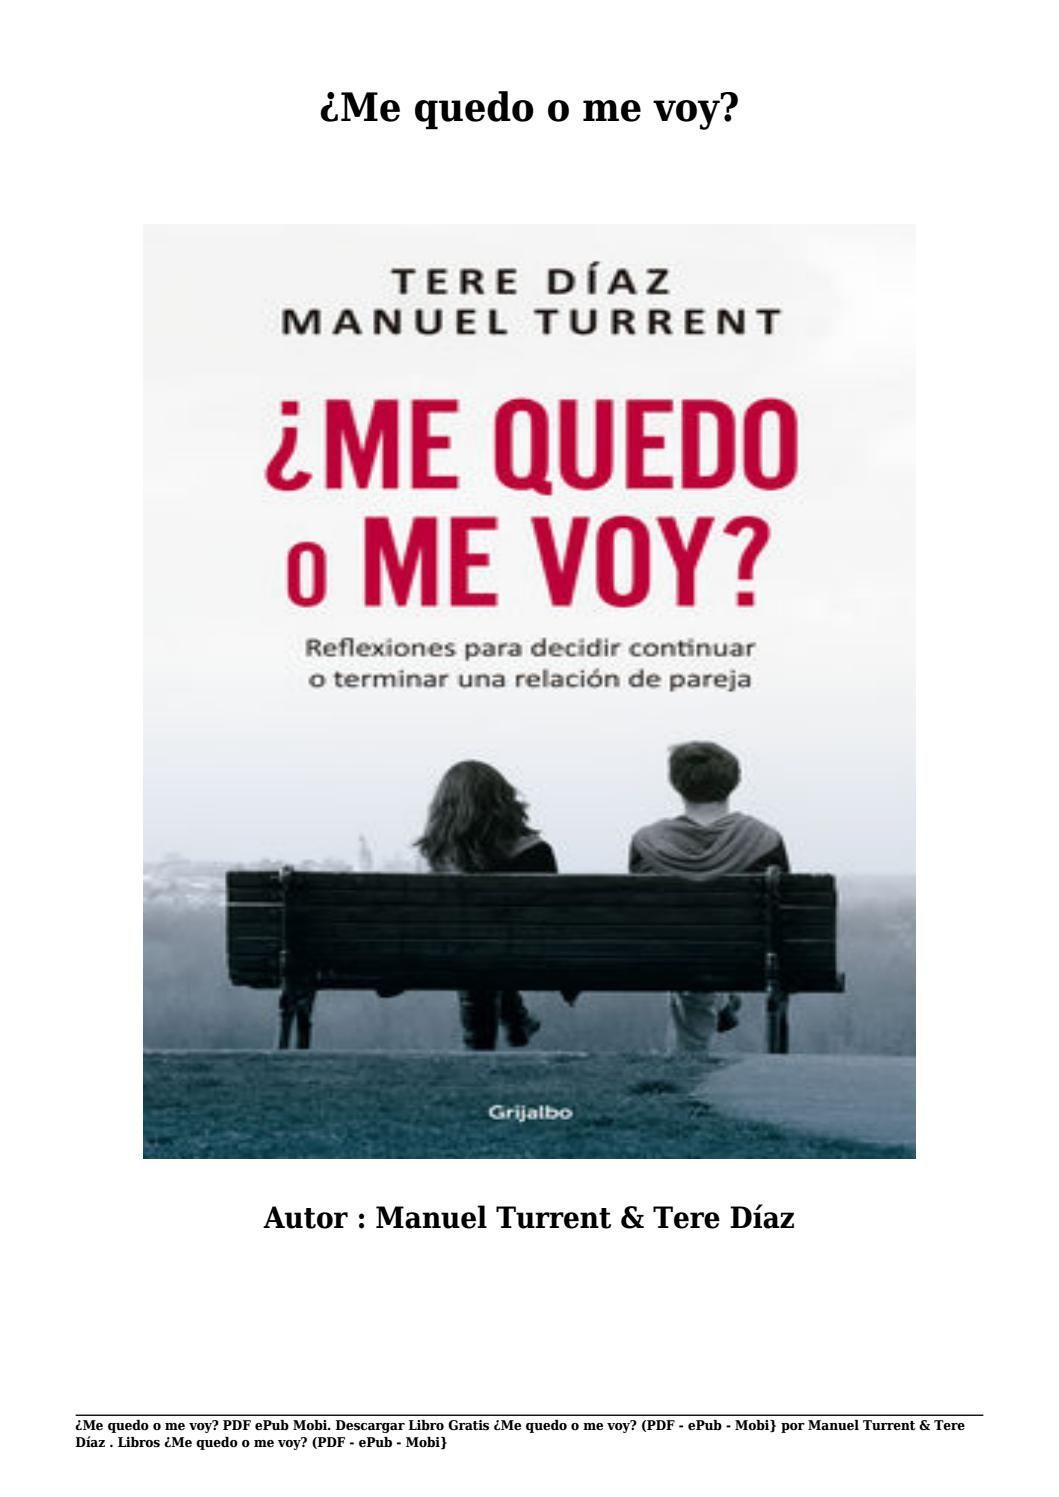 Descargar Libro Gratis Me Quedo O Me Voy Pdf Epub Mobi Por Manuel Turrent Tere Díaz Book Worth Reading Books Audio Books